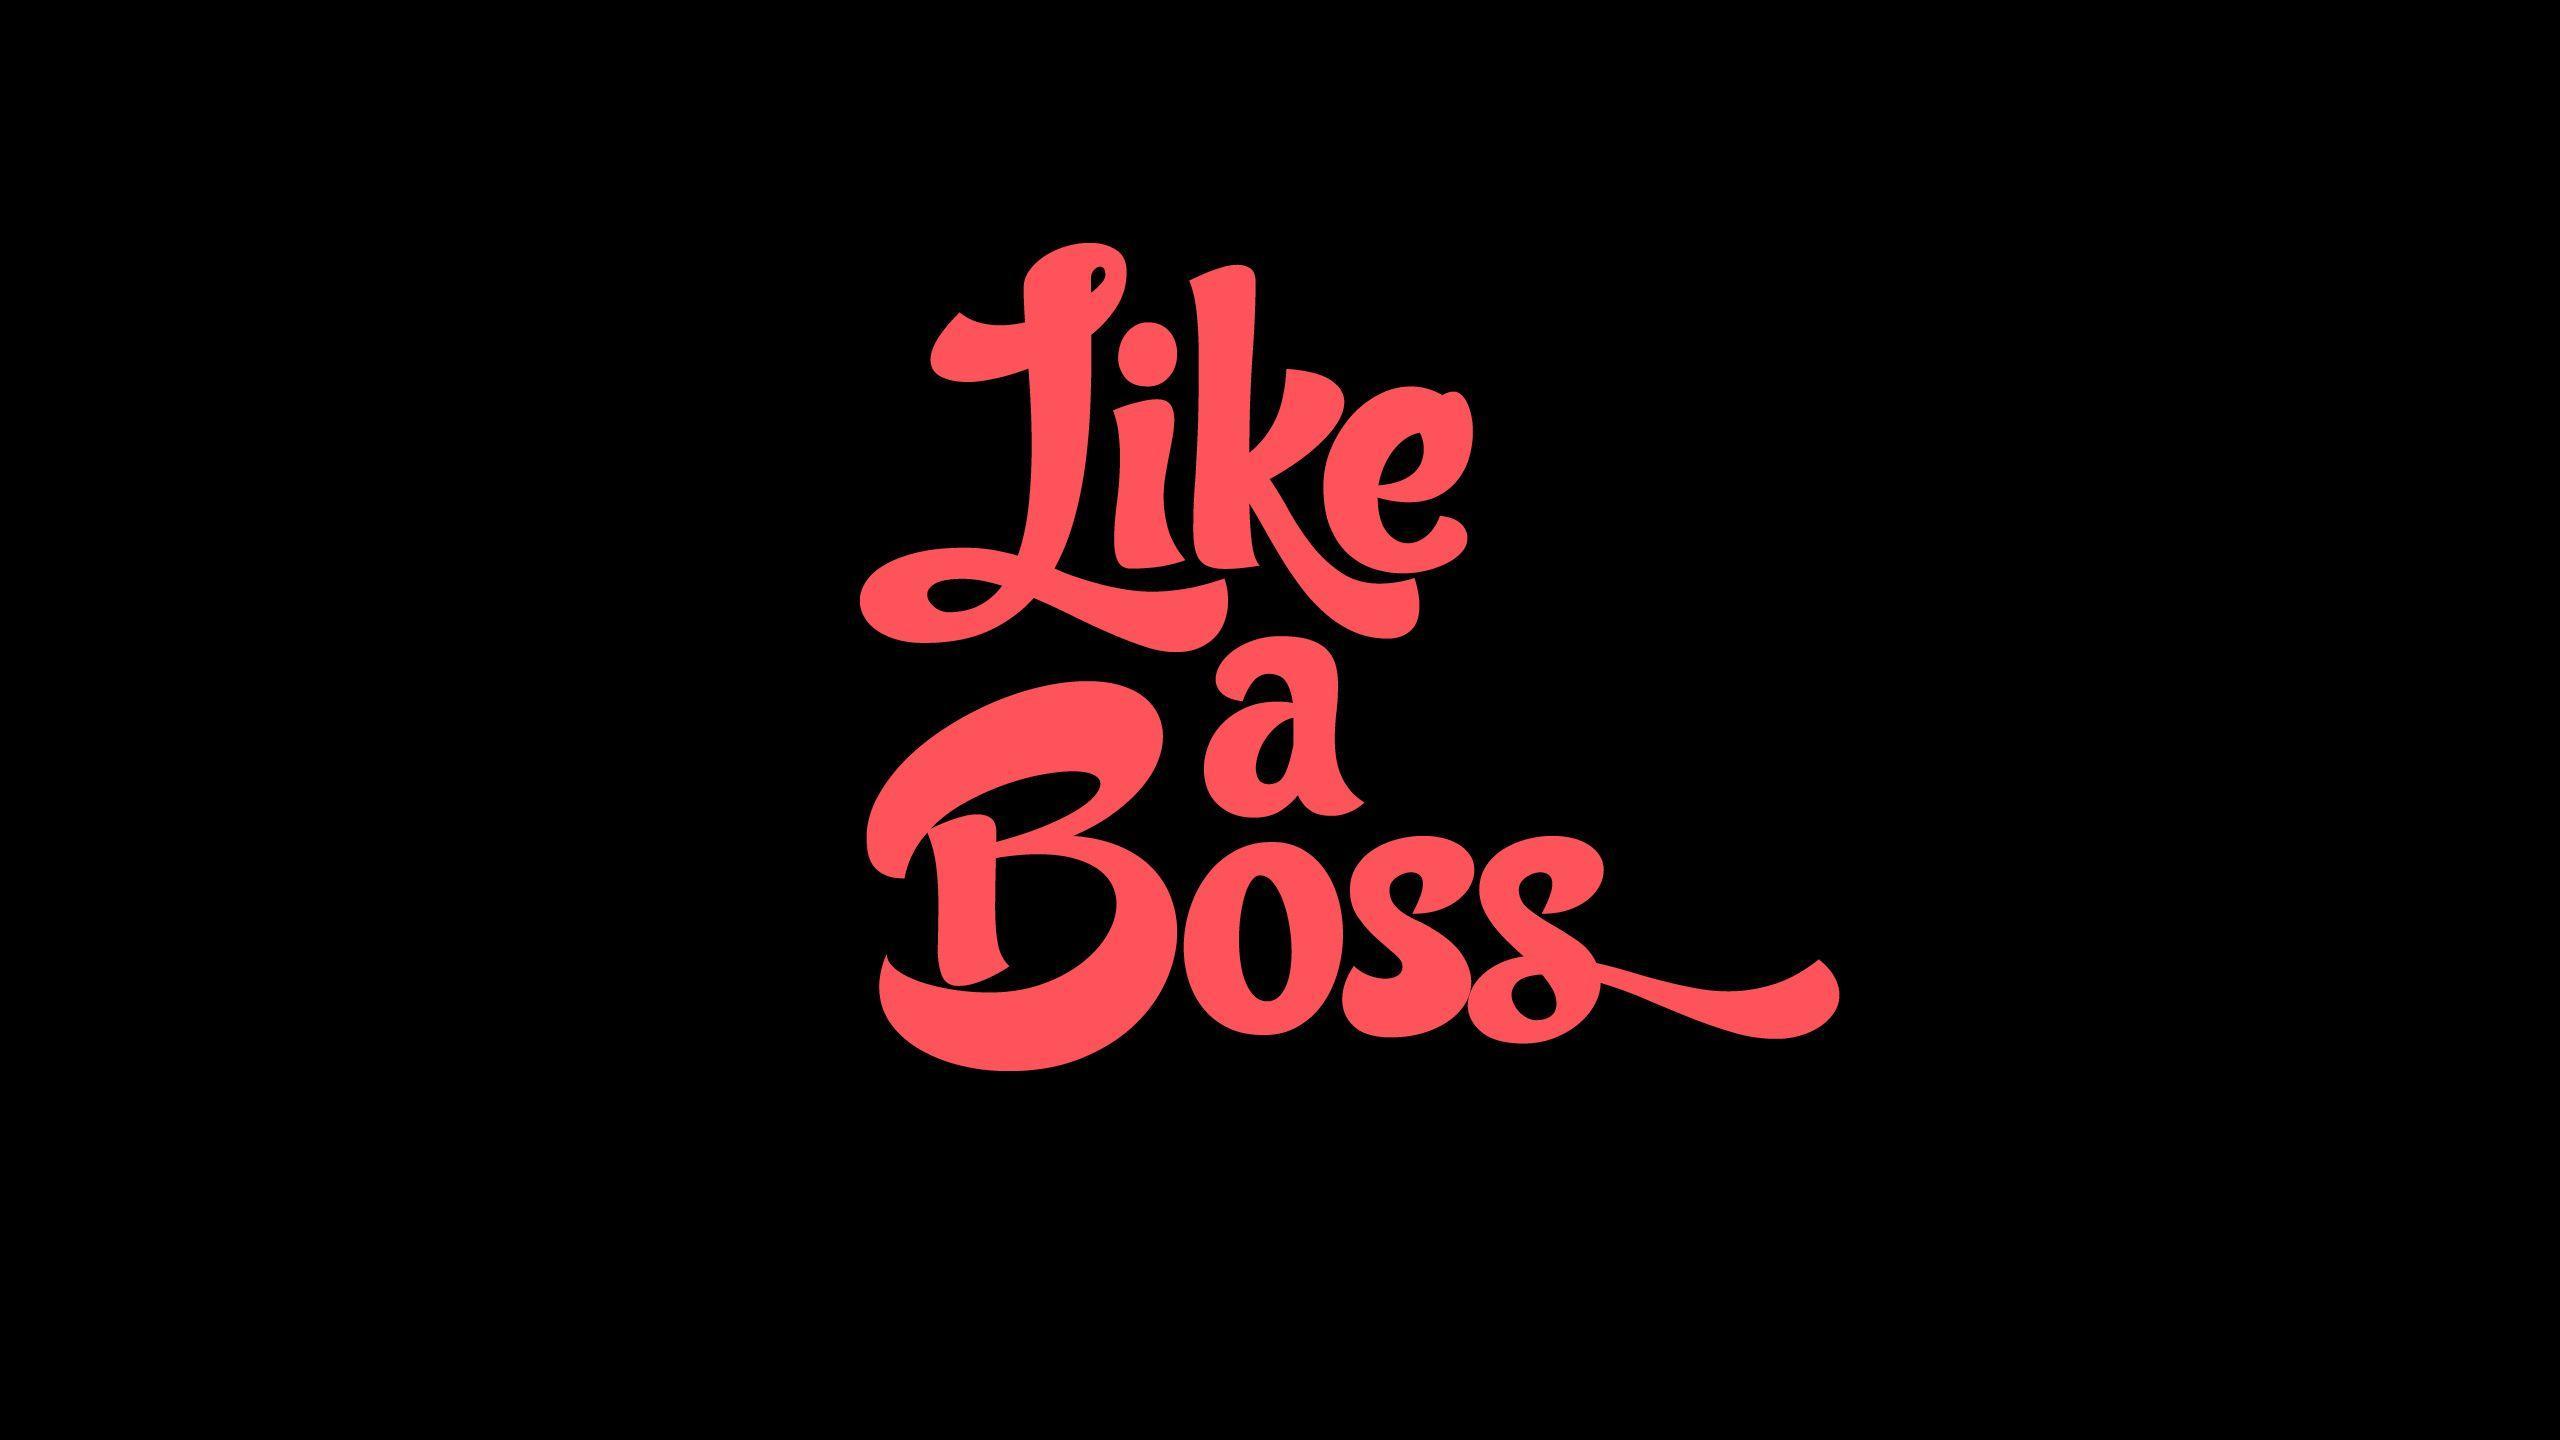 Boss Wallpapers Top Free Boss Backgrounds Wallpaperaccess